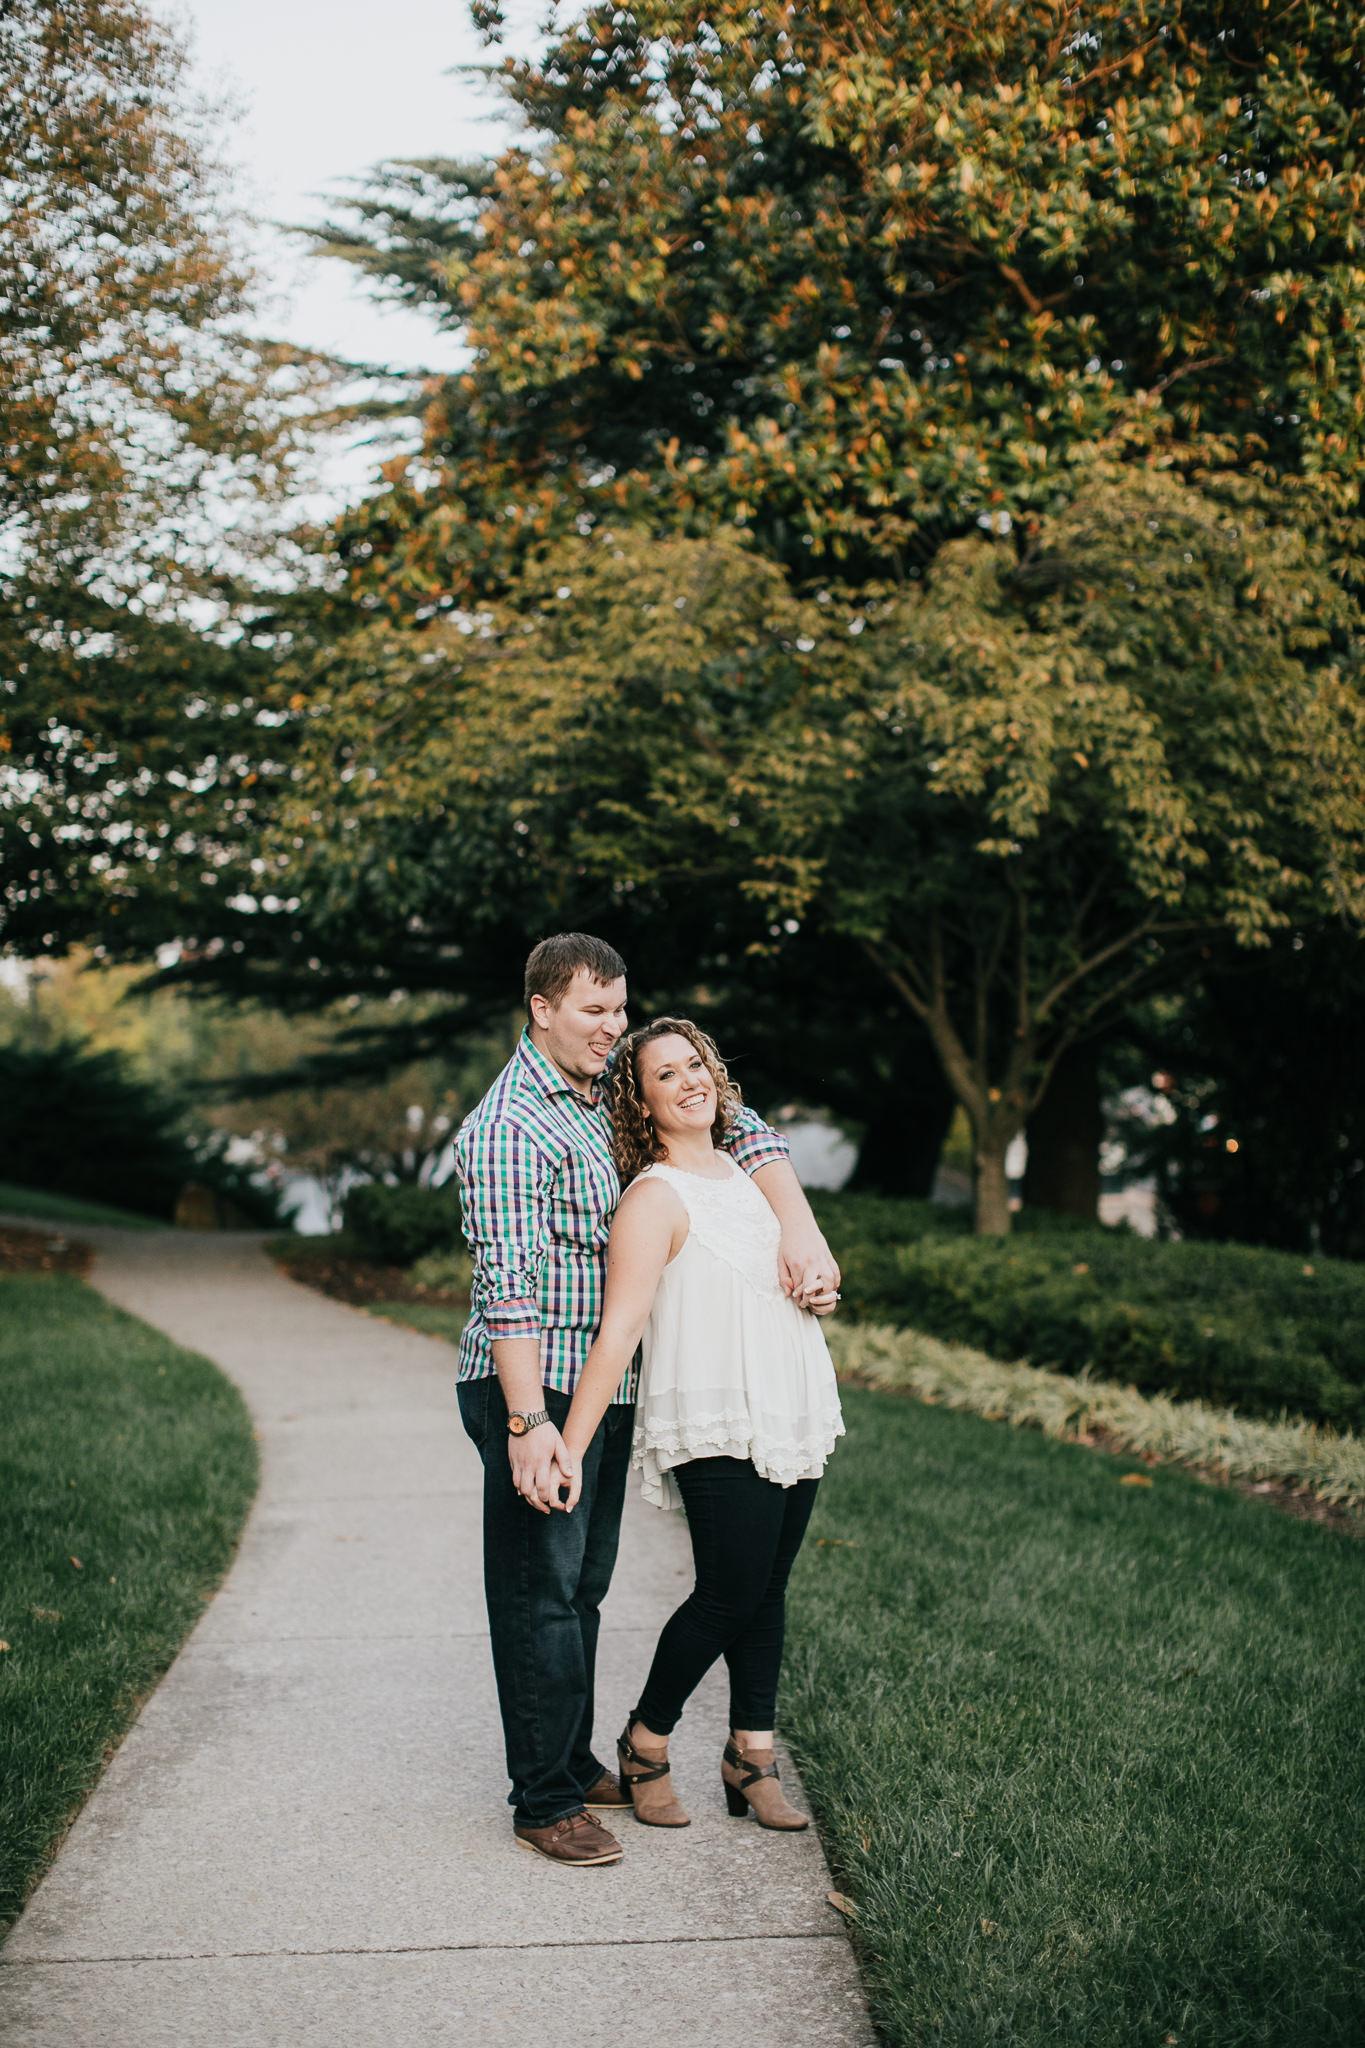 Roanoke - Engagement- Virginia wedding photographer - Pat Cori Photography-14.jpg